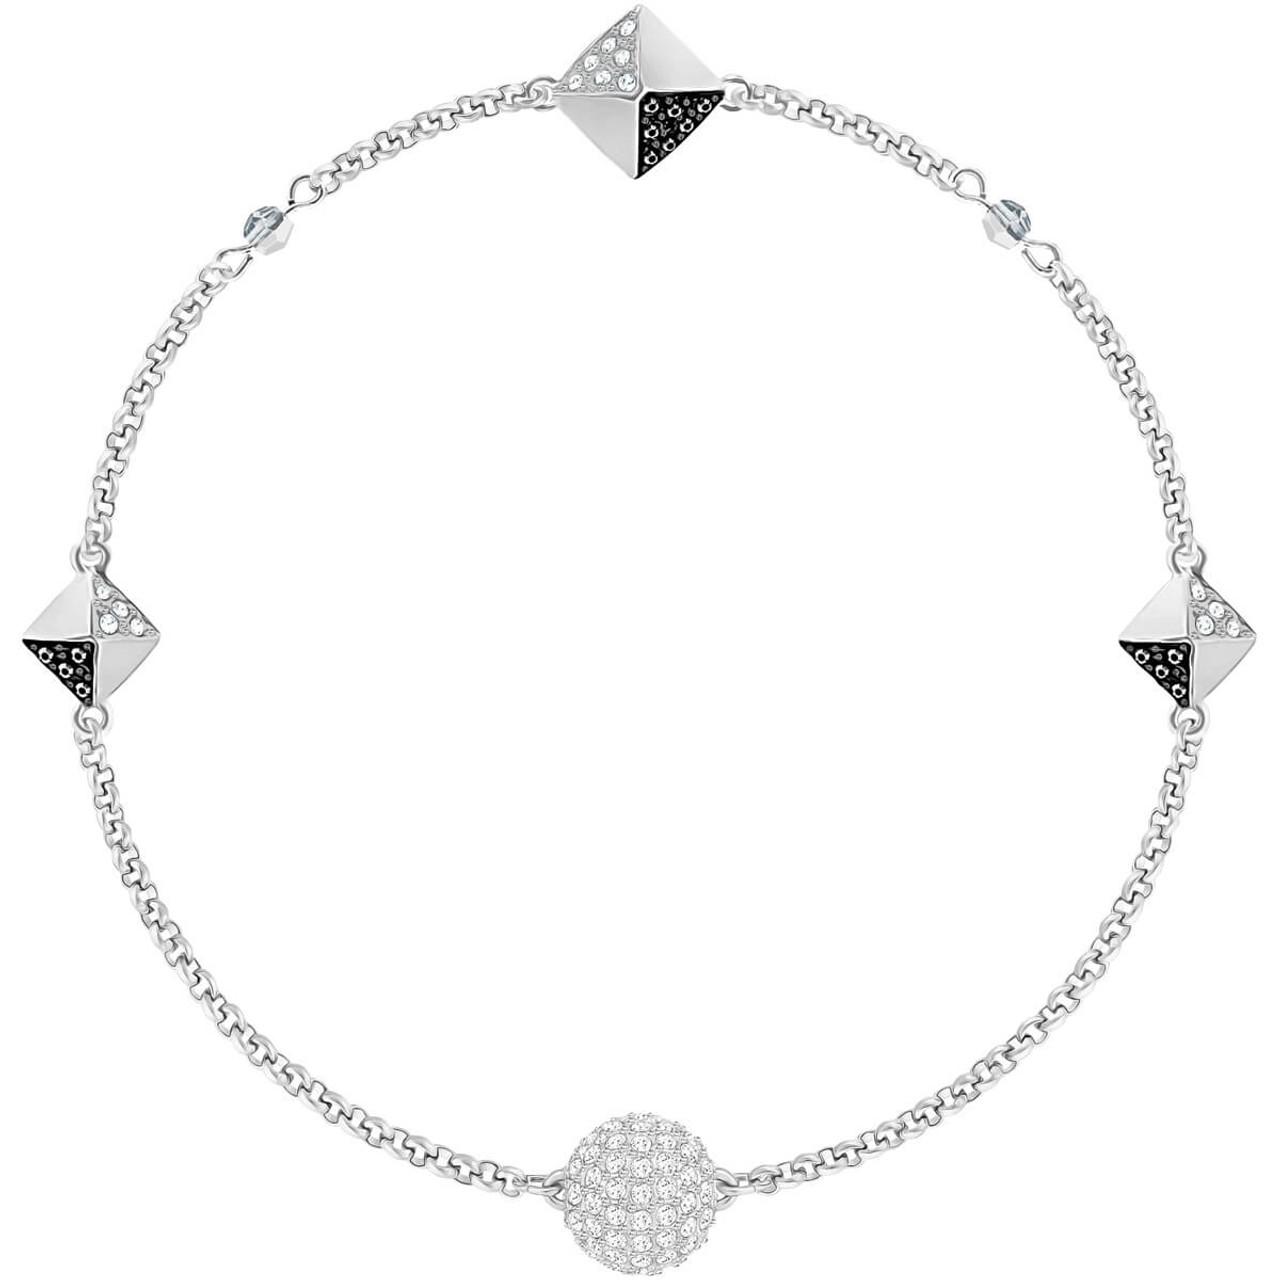 Swarovski Remix Collection Squares Bracelet, Black in Rhodium